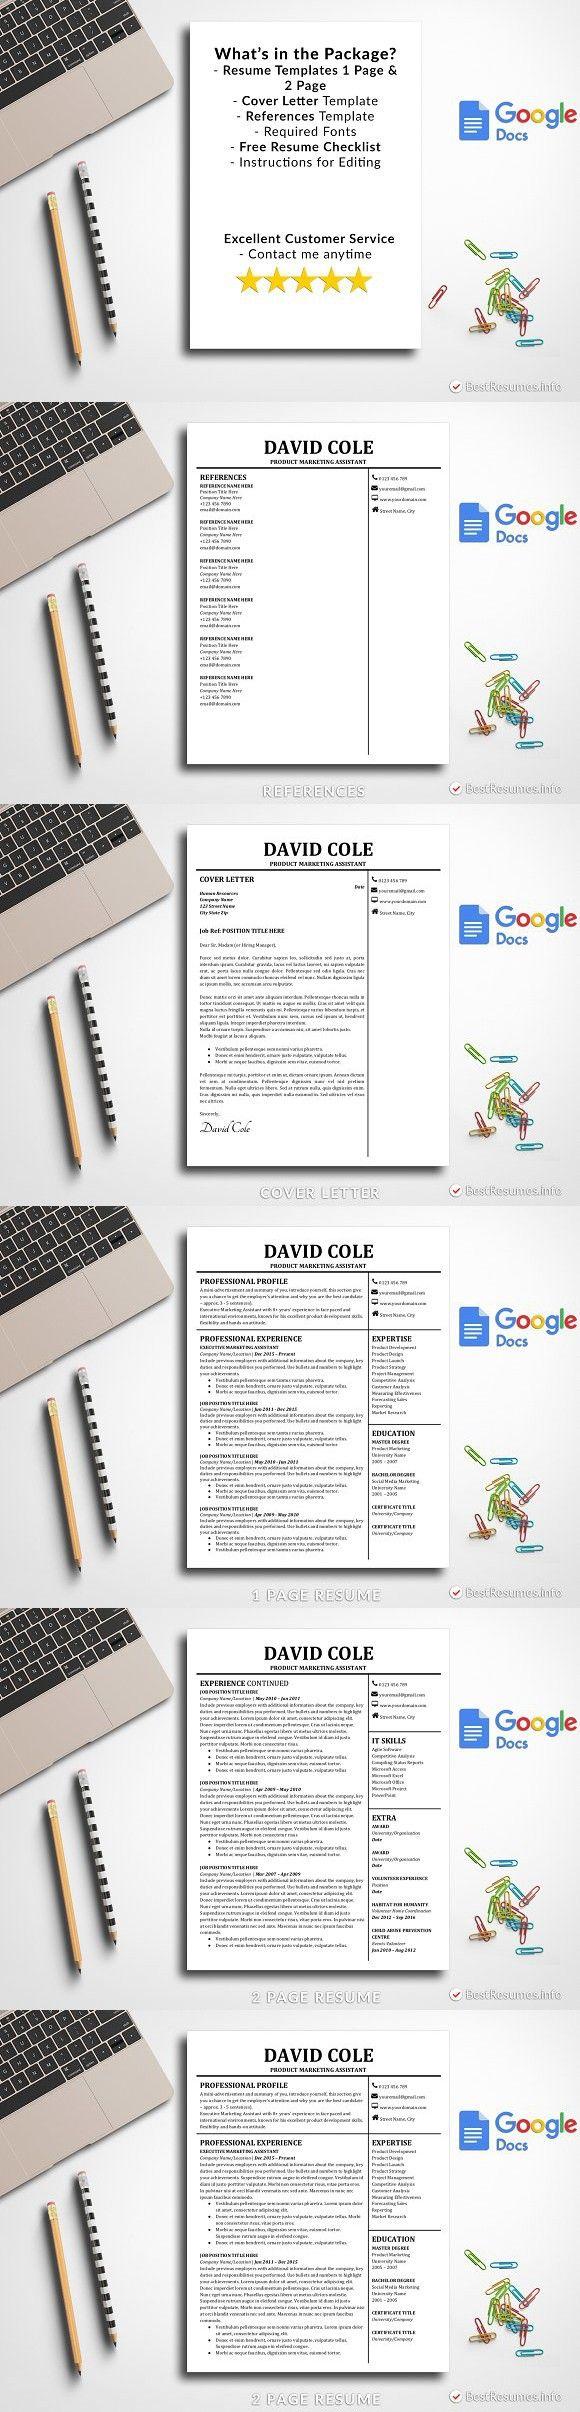 Resume On Google Docs Resume Template Google Docs  Simple Resume Templates  Pinterest .